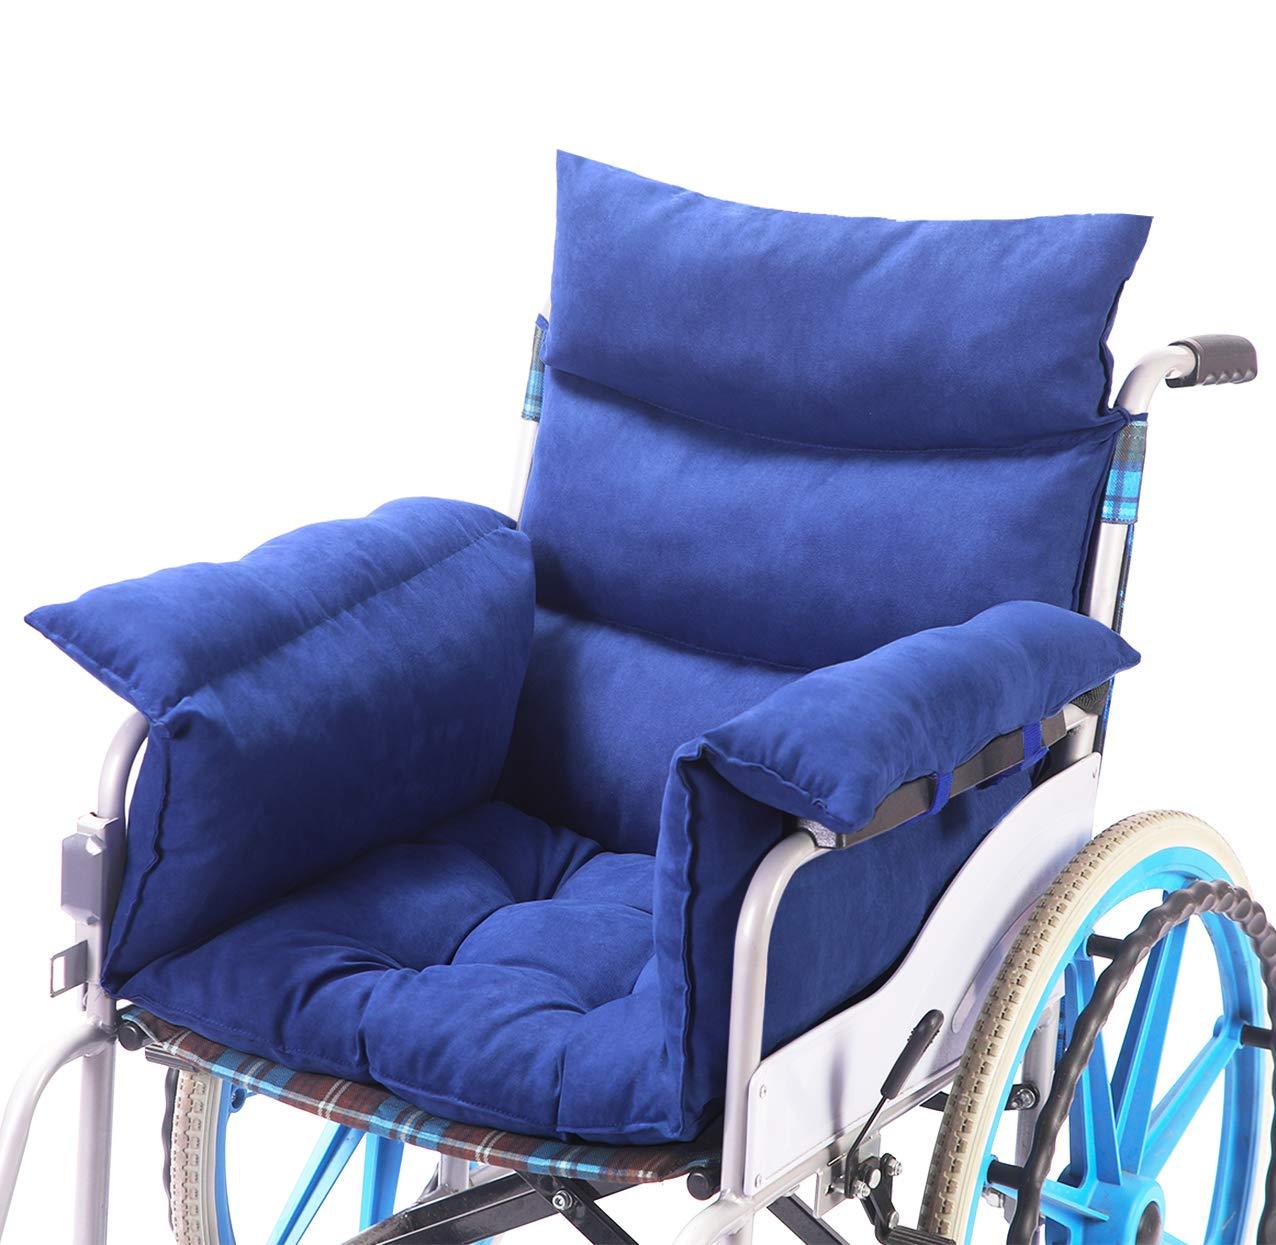 Wheelchair Cushion Soft Cotton Wheelchair Accessory Helps Prevent Pressure, Blue by Trendcode